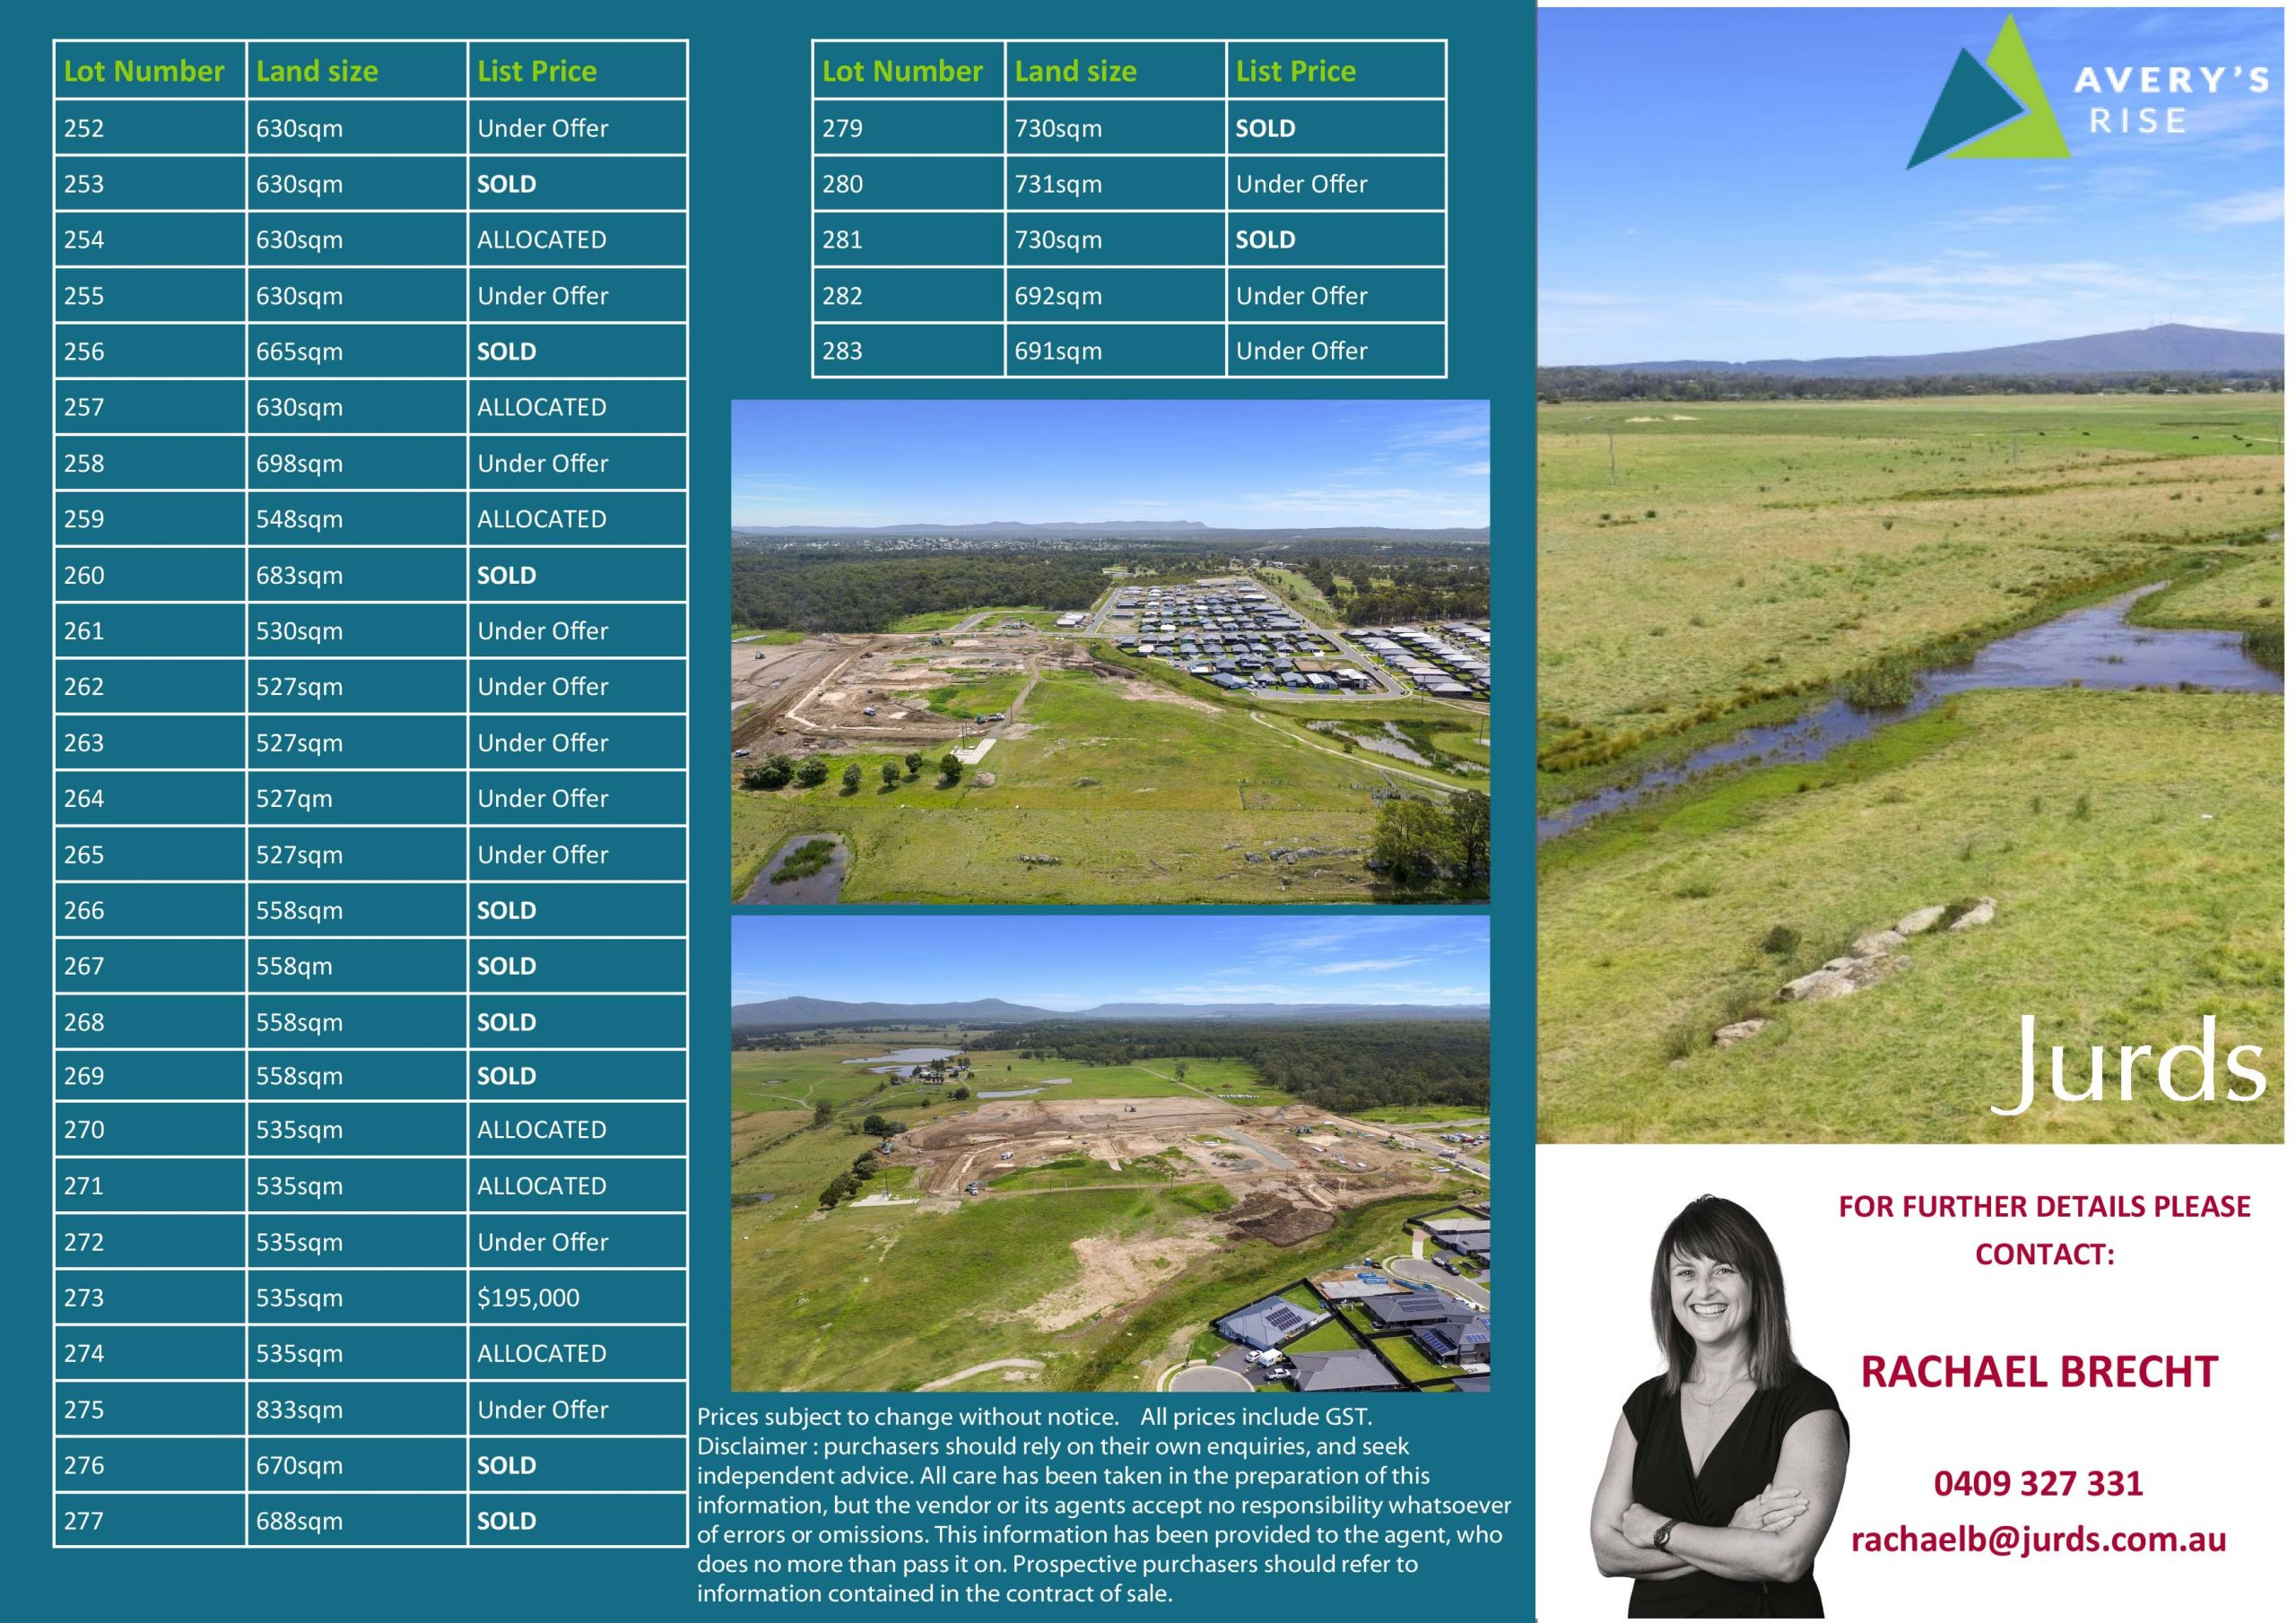 averys-rise-2c-brochure-price-list-2